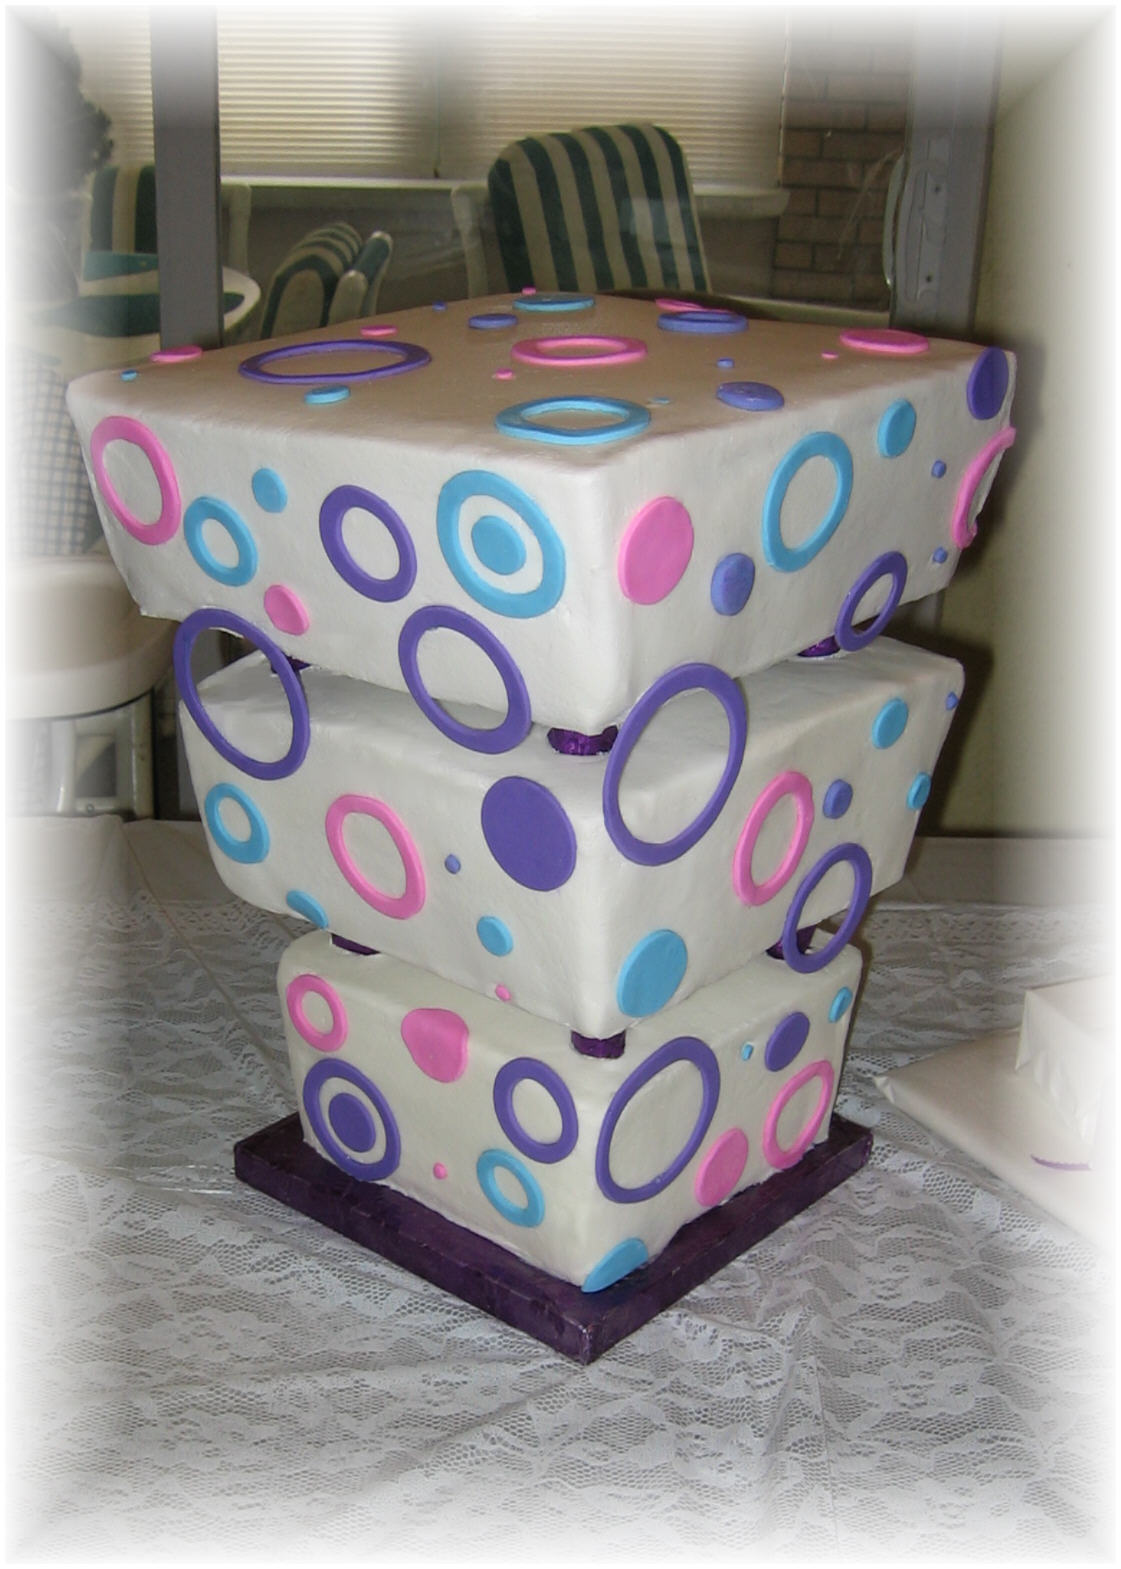 Sandy S Sweets Birthday Upside Down Cake